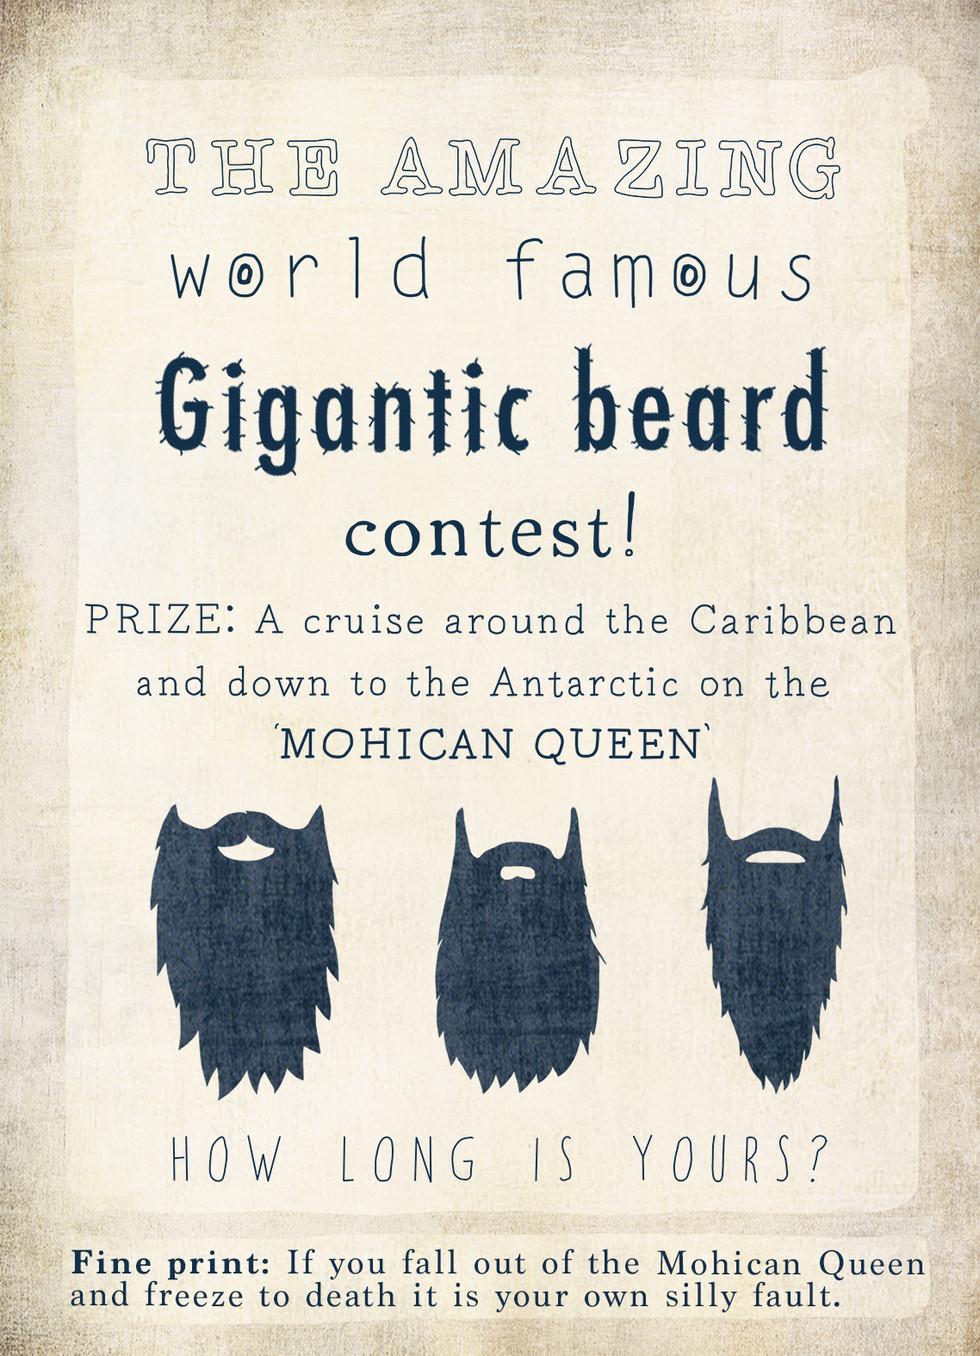 Longest beard poster